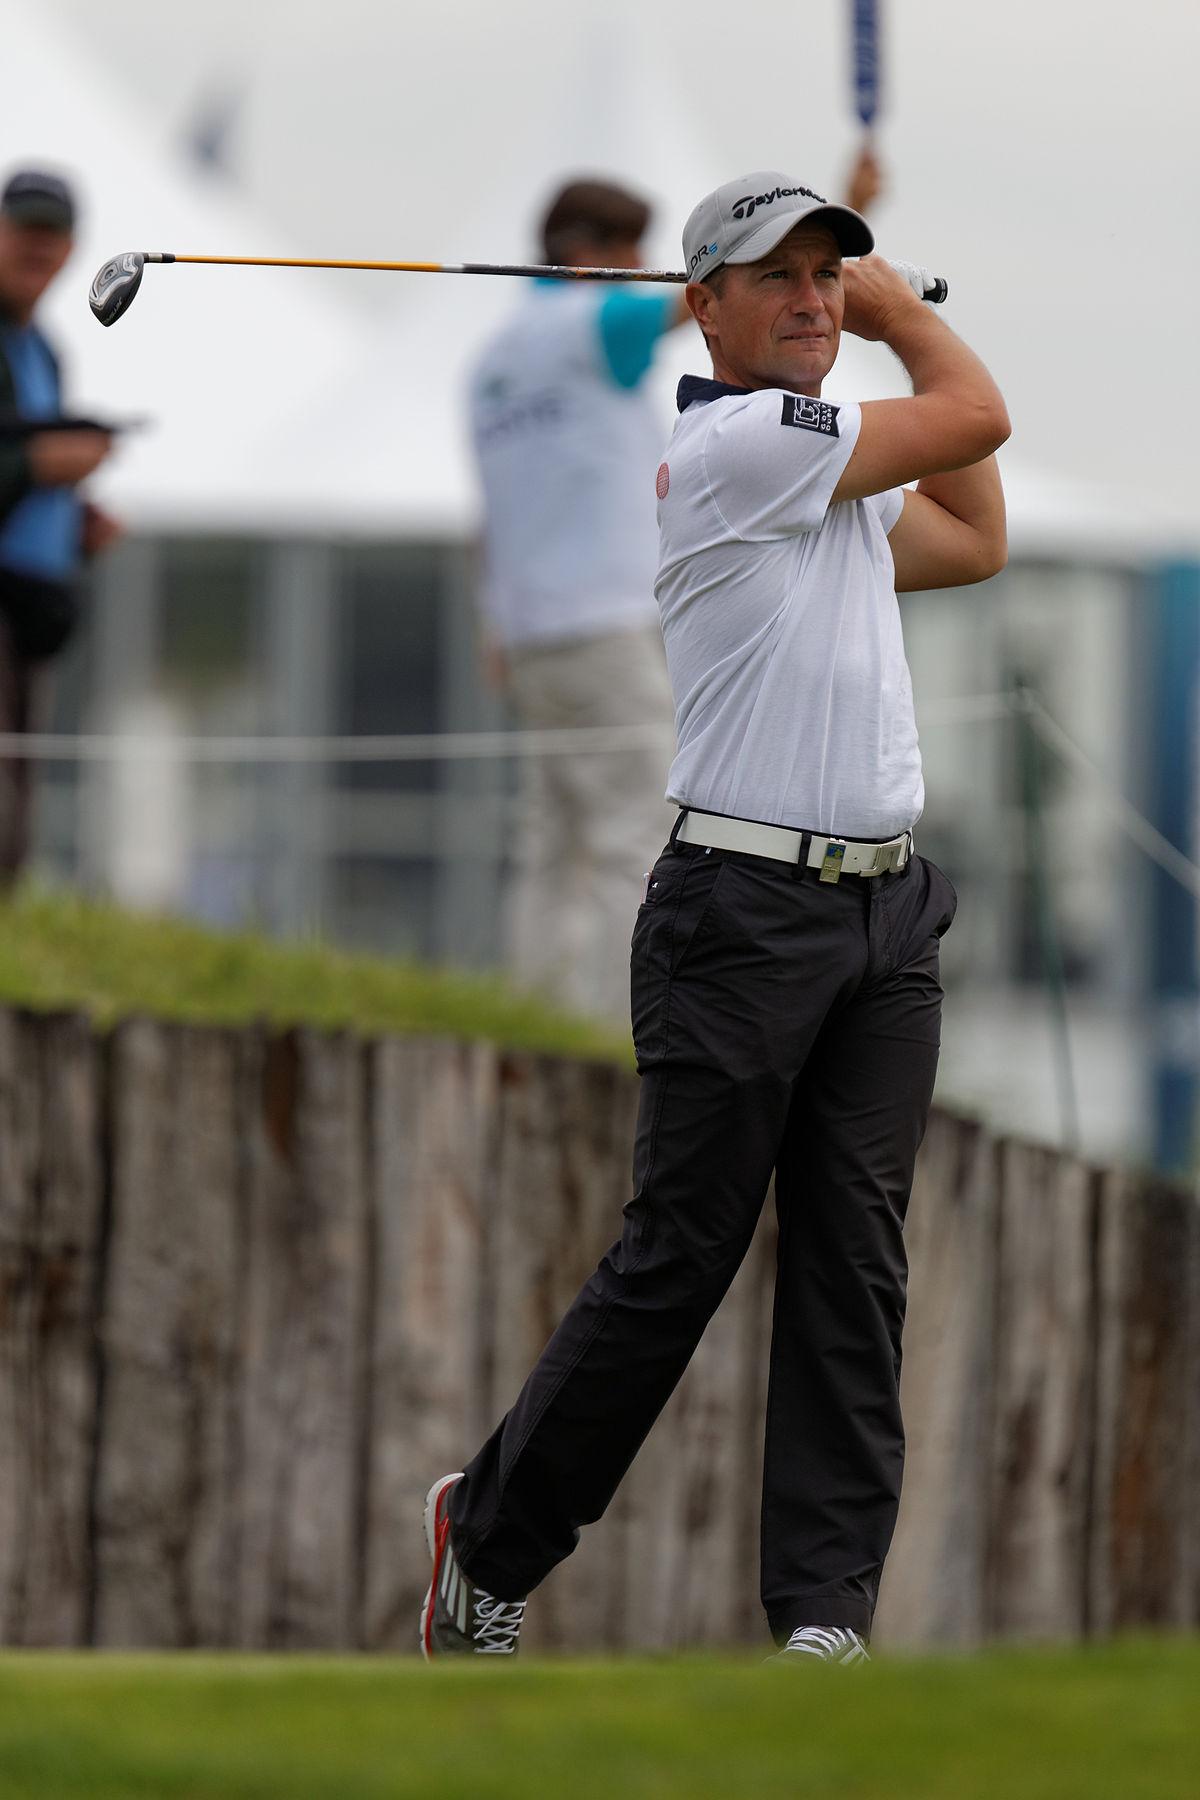 Steve Webster Golfer Wikipedia